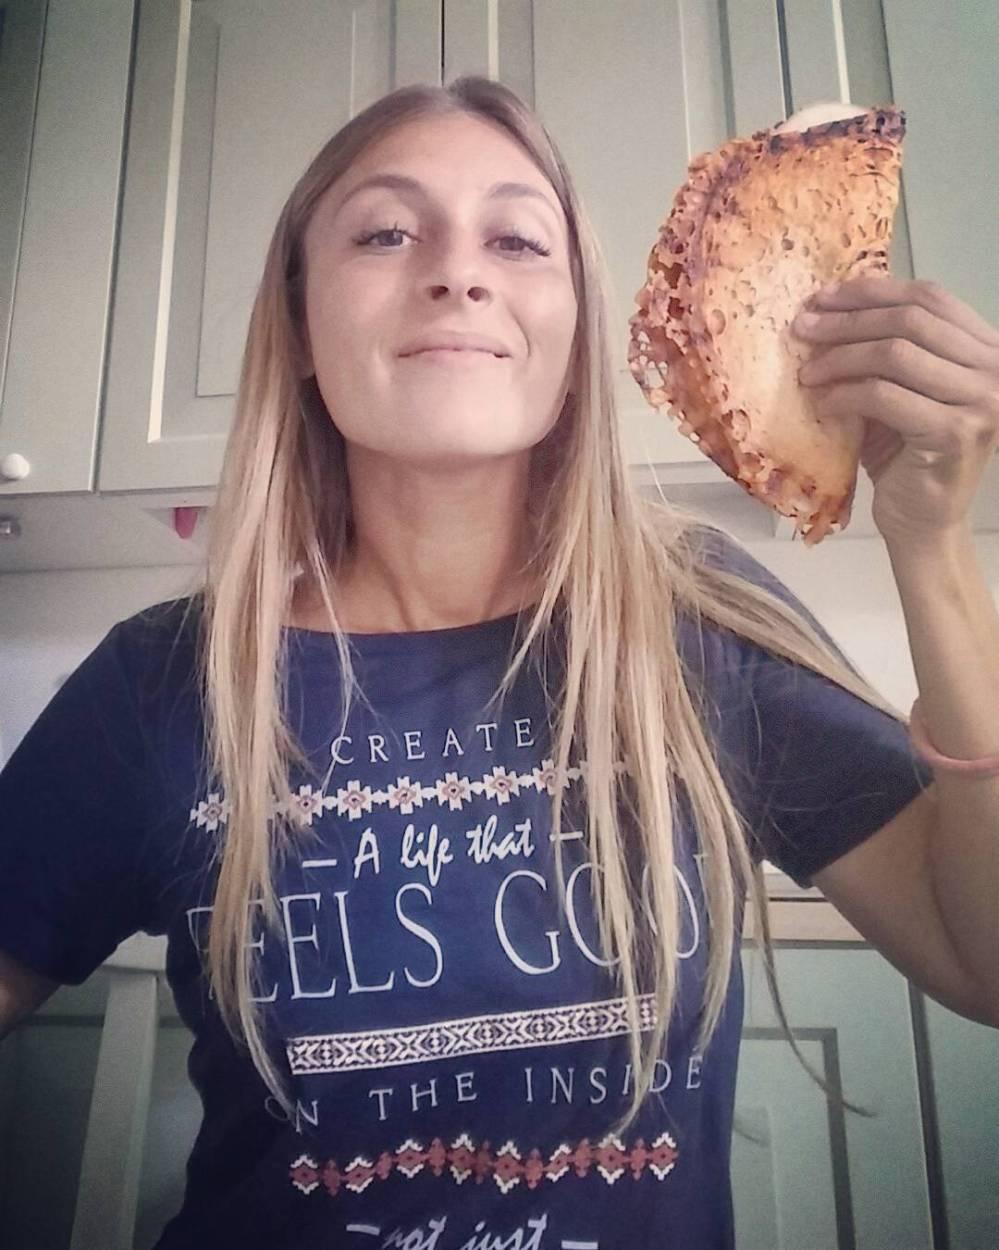 #piadina #quark #paprika #curcuma #lunch #newlife #healthy #lightfood #quartafase #dukan #diet #dukanstyle #food #feelgood #insideout #summercooking #cucinaproteica #cucinadulight